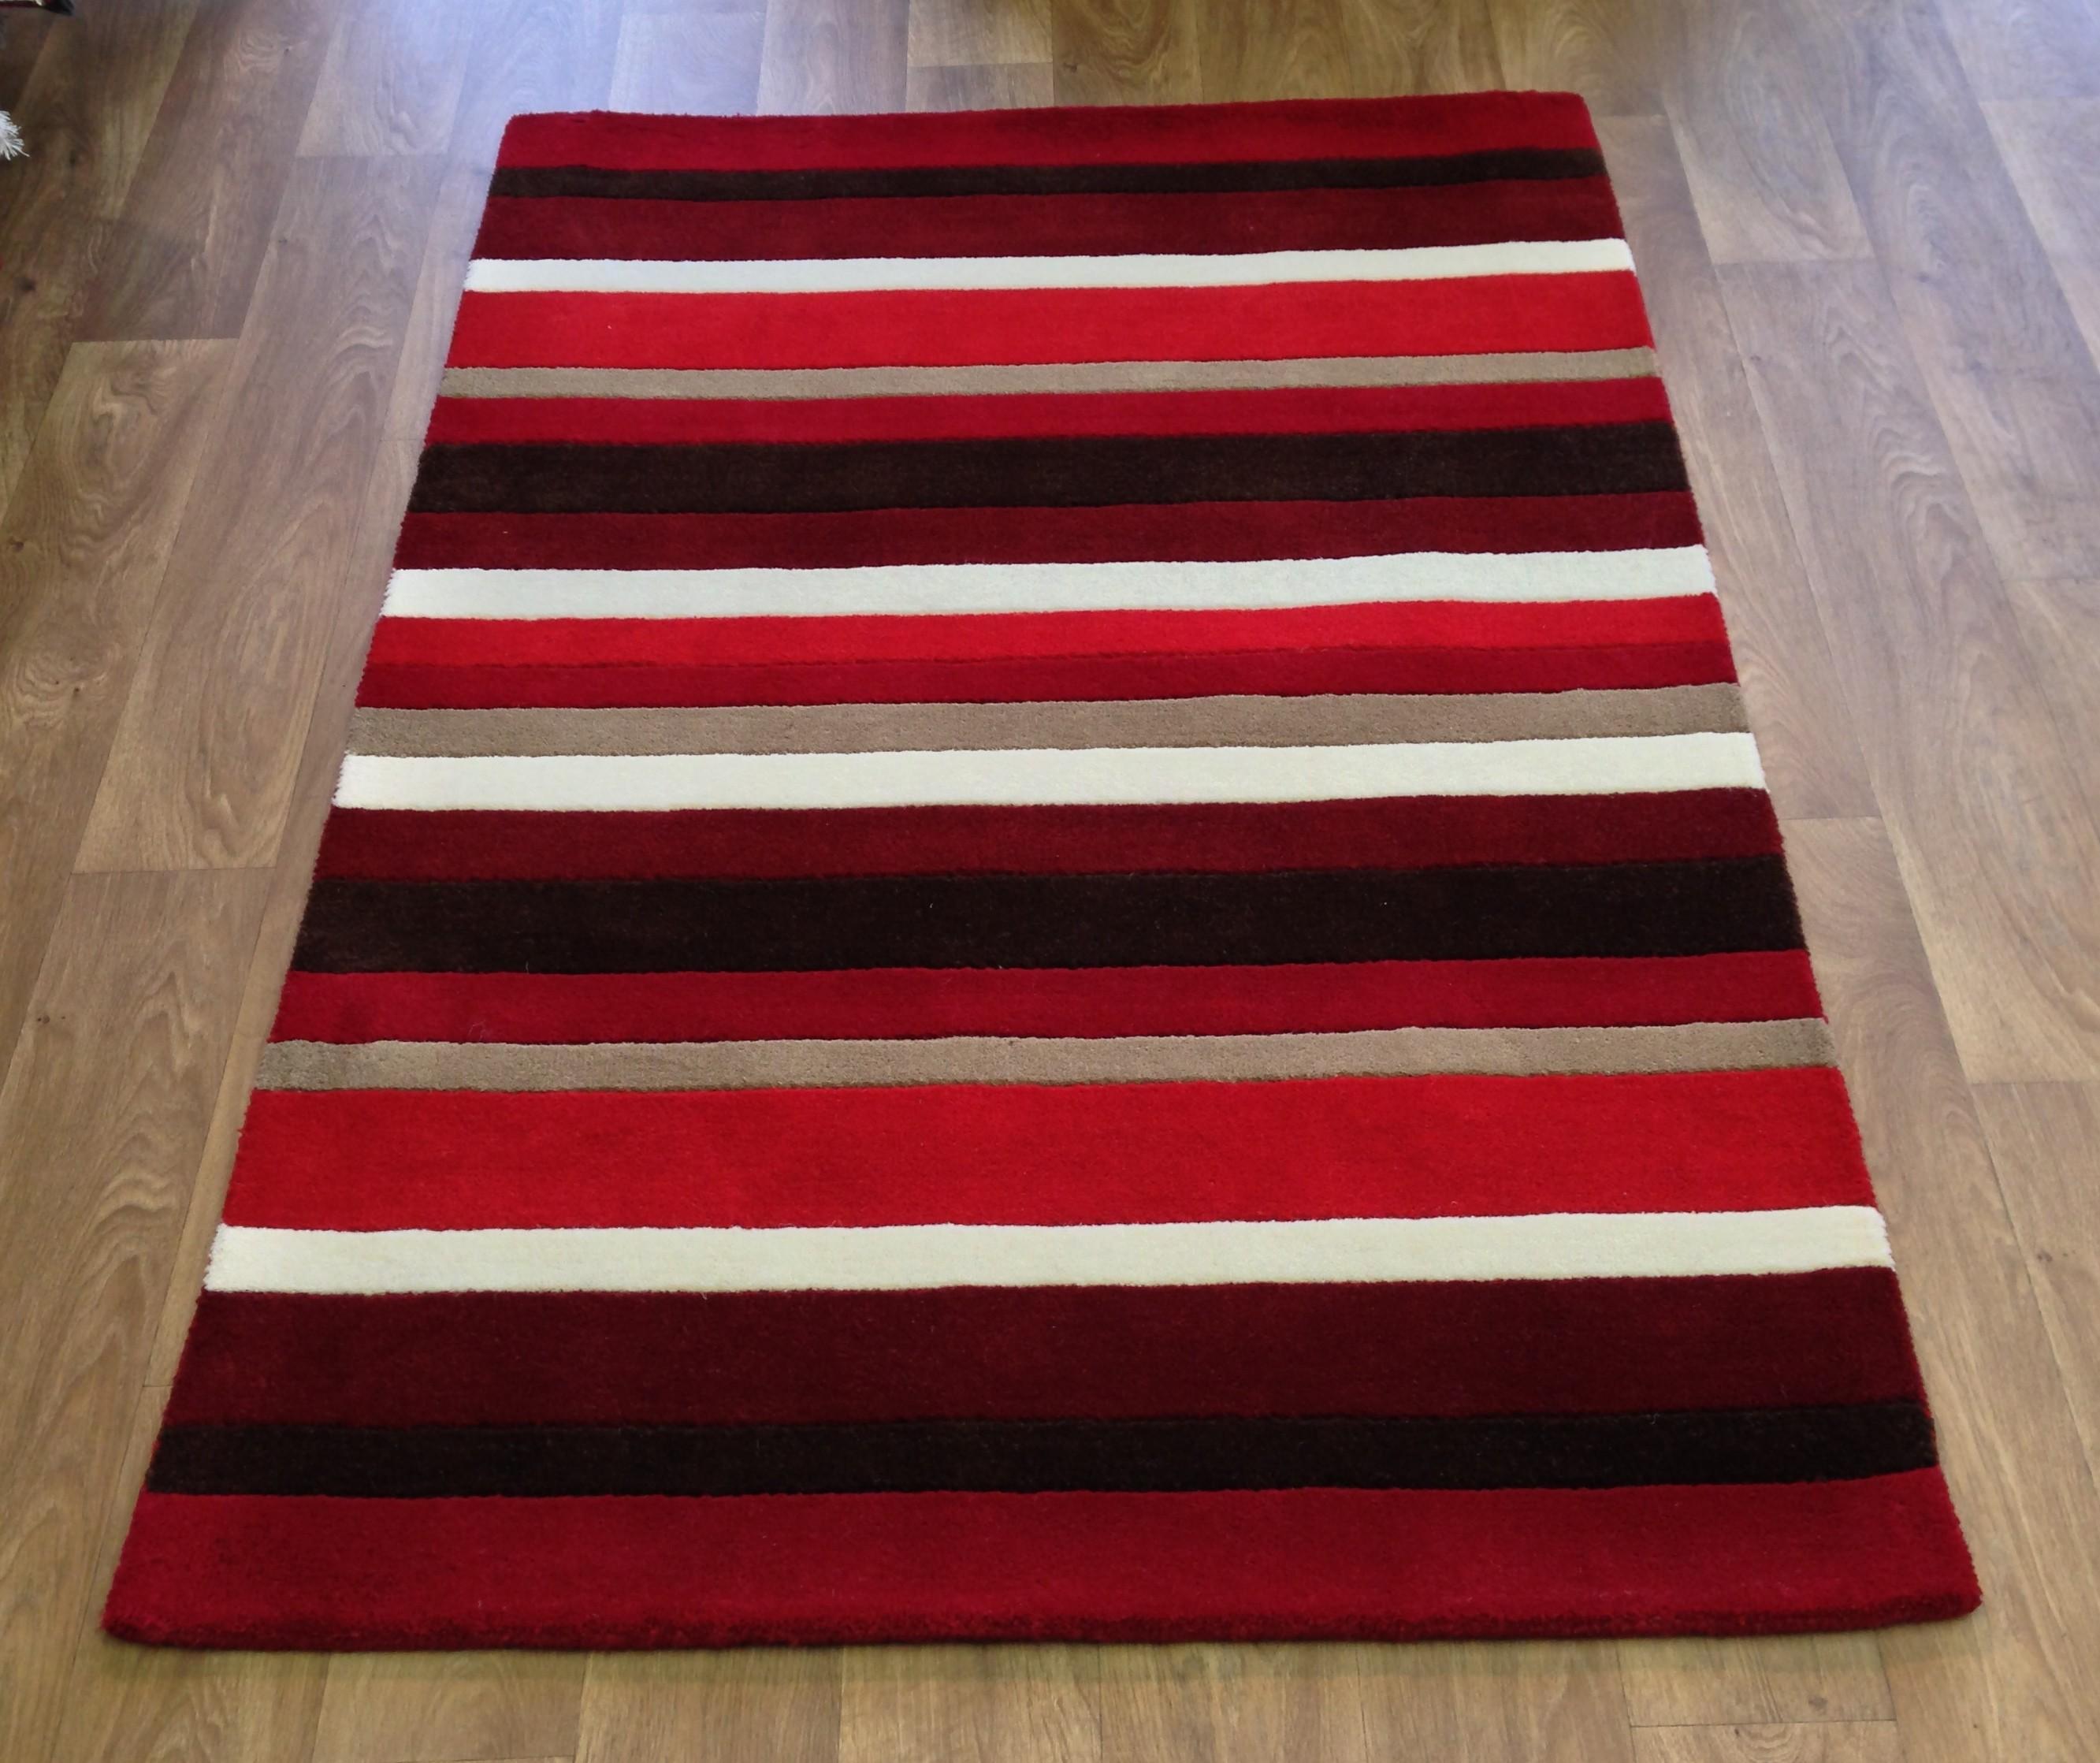 striped kitchen rug knotty pine cabinets for sale modern wool red brown beige cream small medium